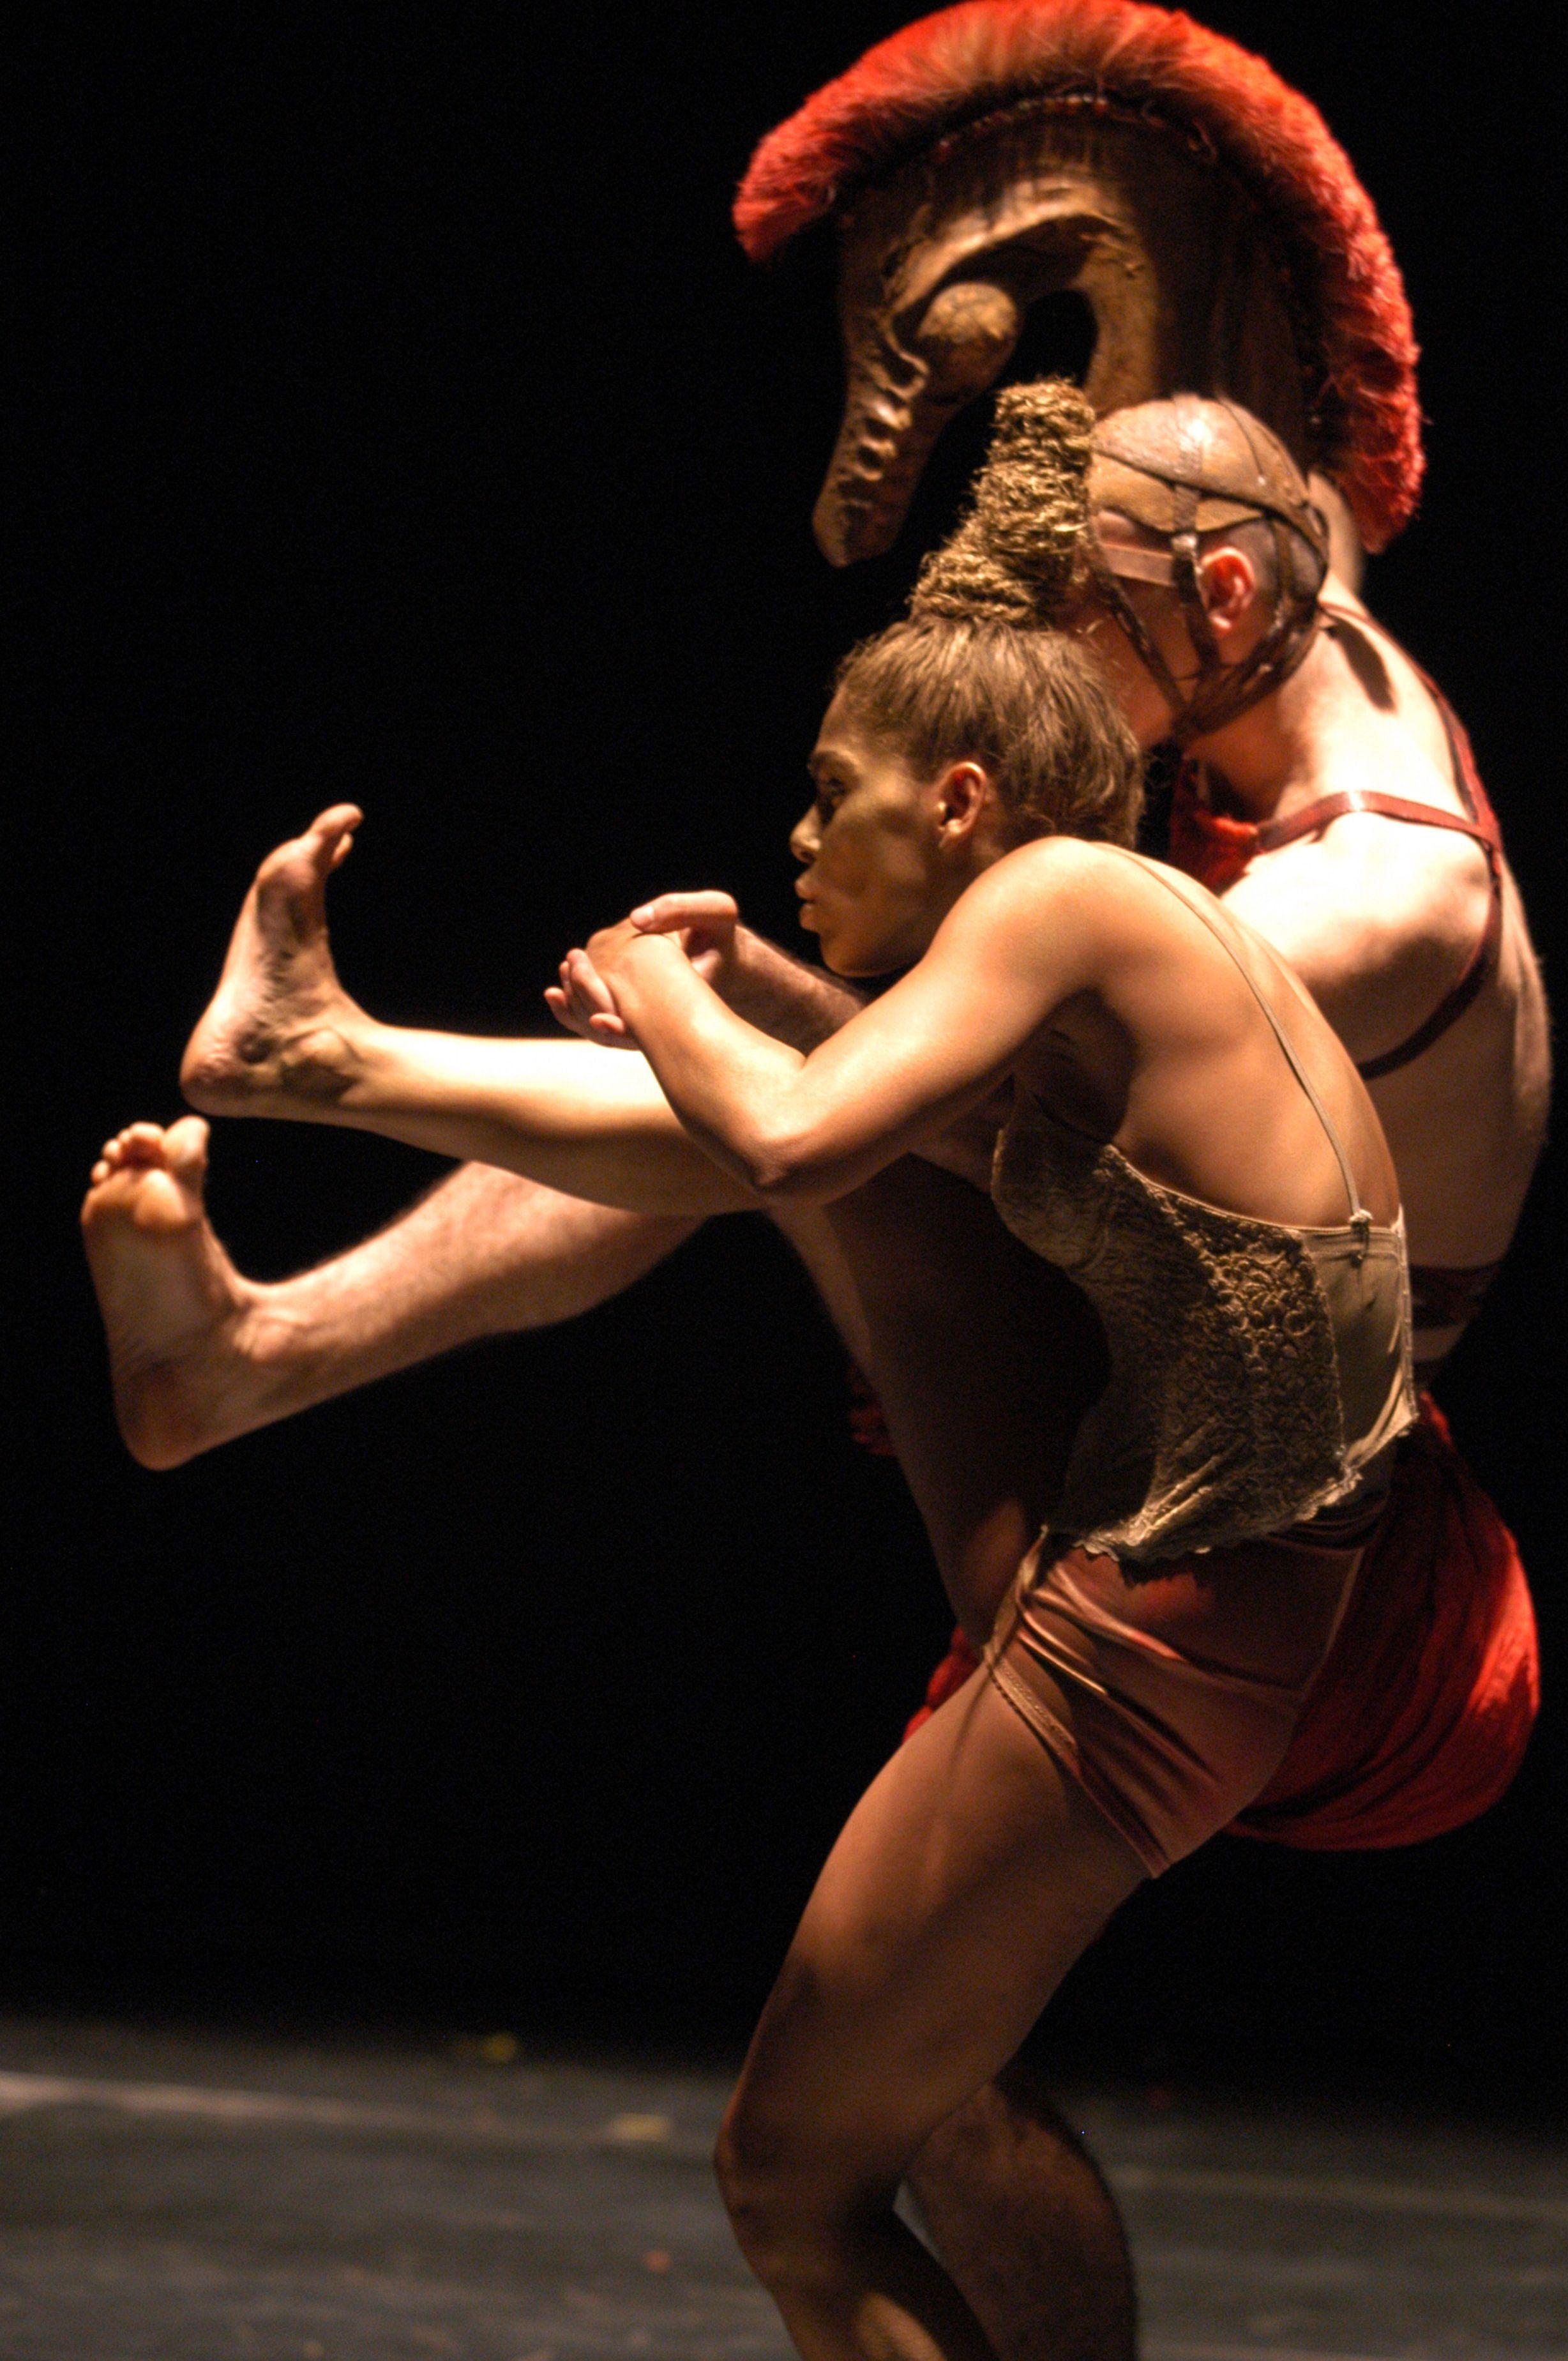 Kibbutz Contemporary Dance Company Contemporary Dance Modern Dance Dance Photography